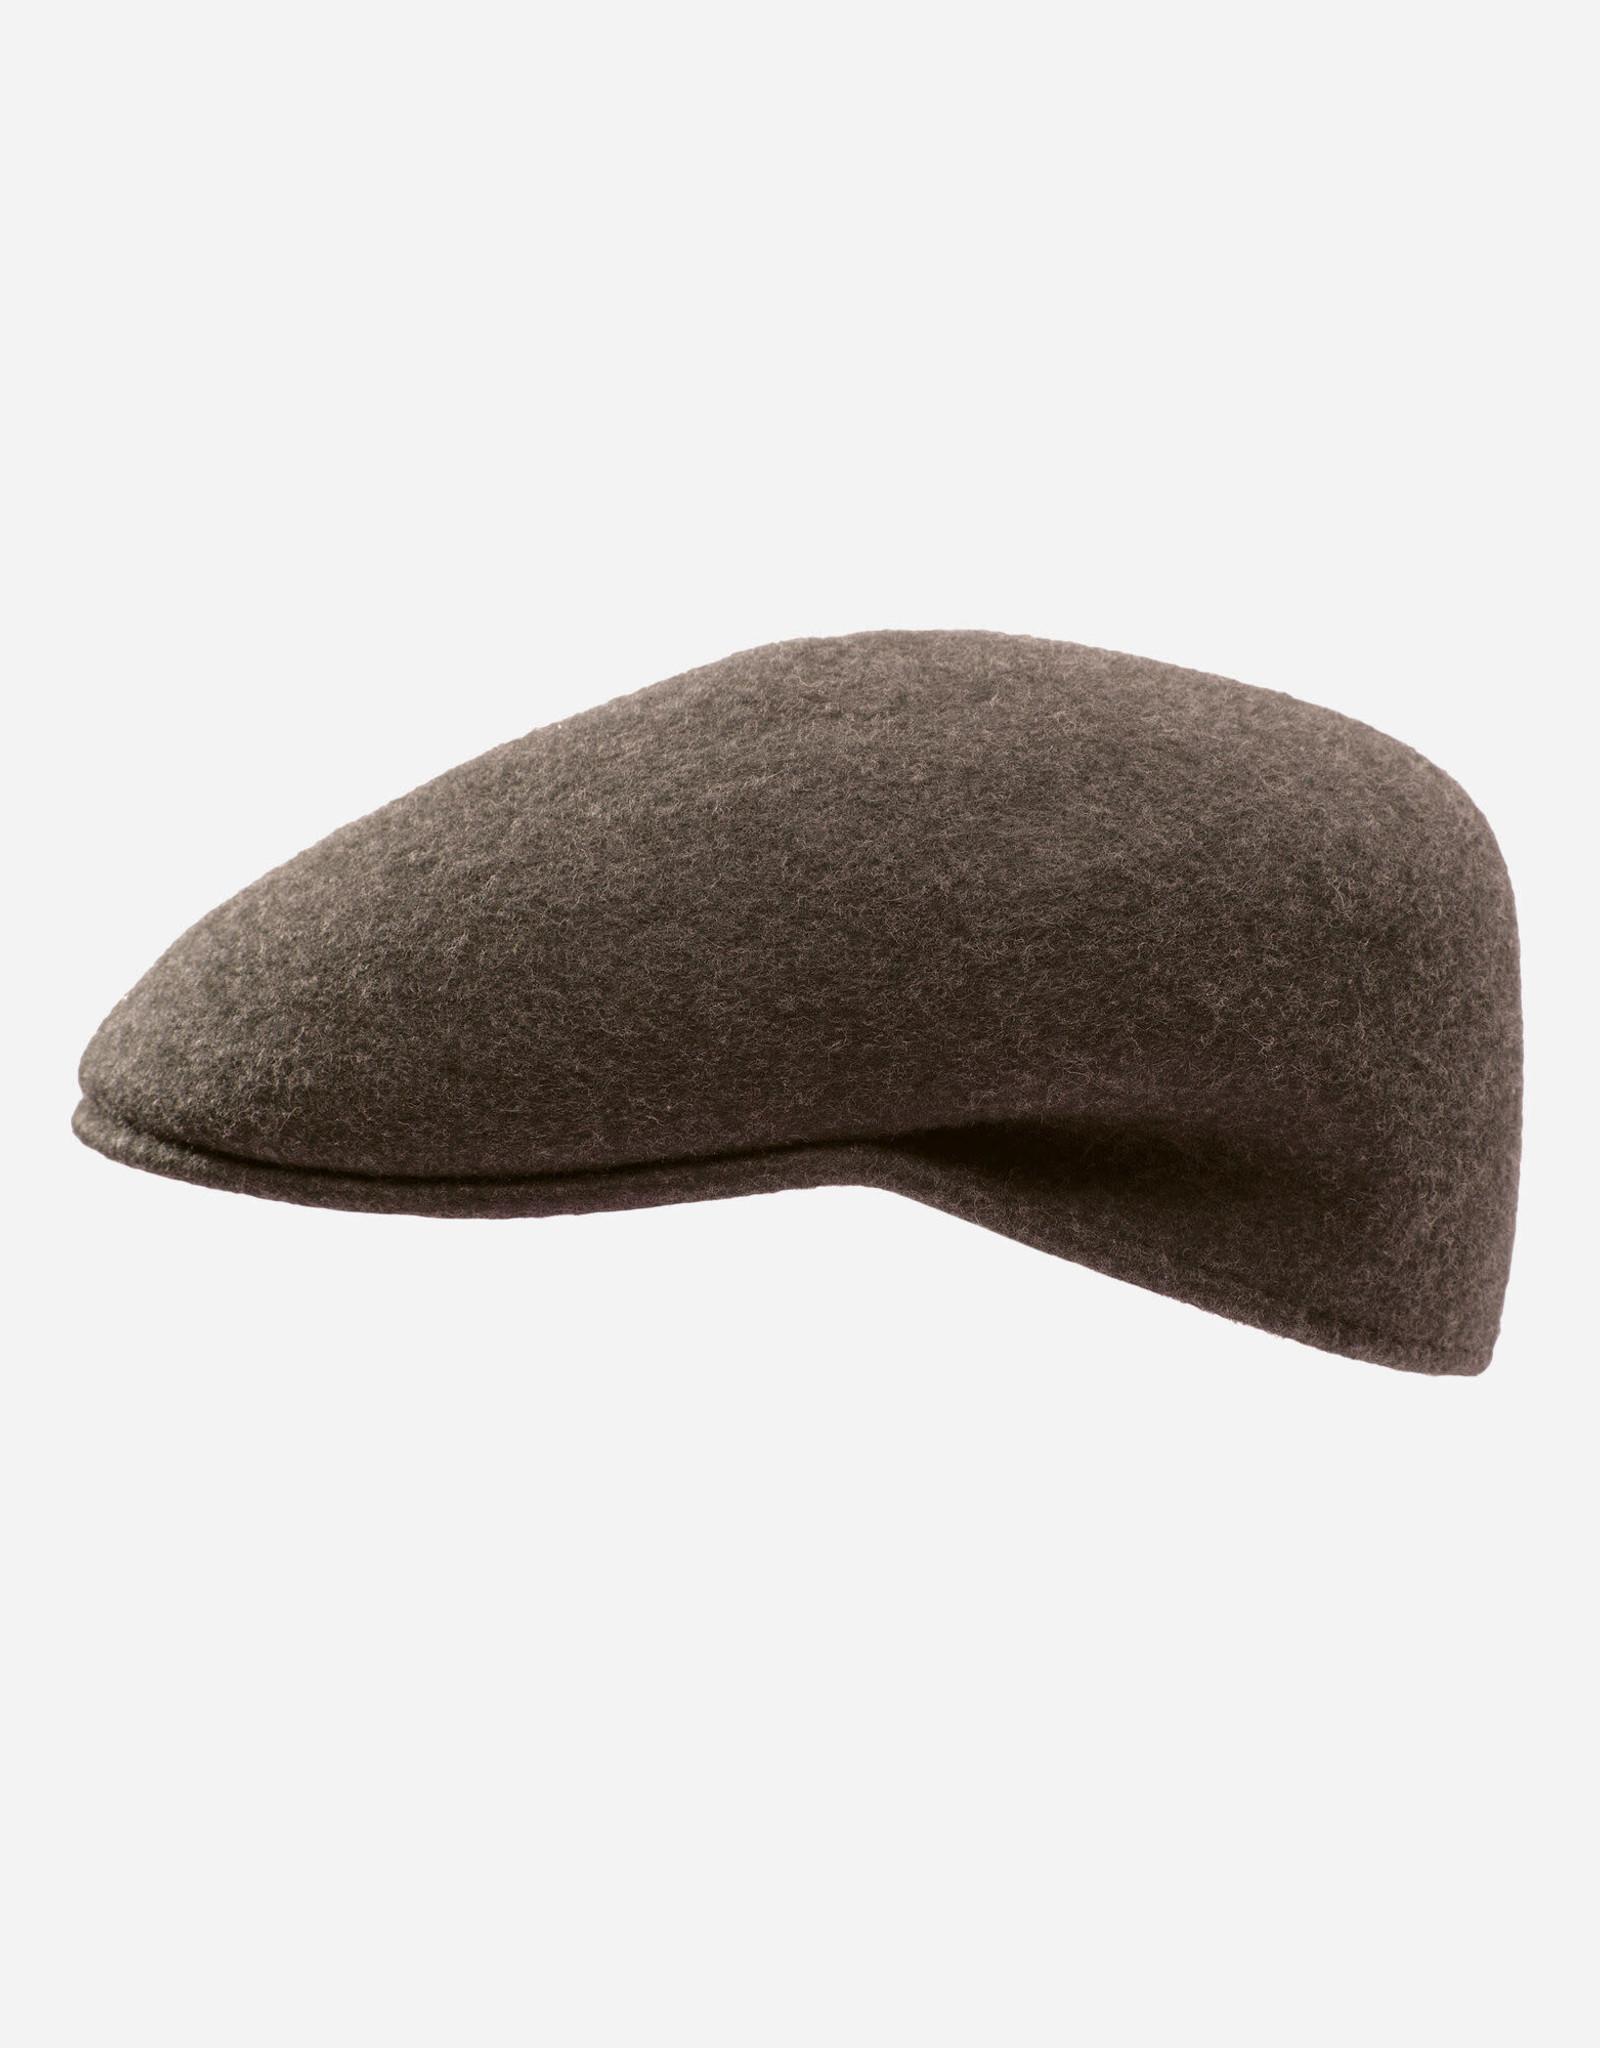 PENDLETON HAT WOOL CUFFLEY DARK TAN MEDIUM